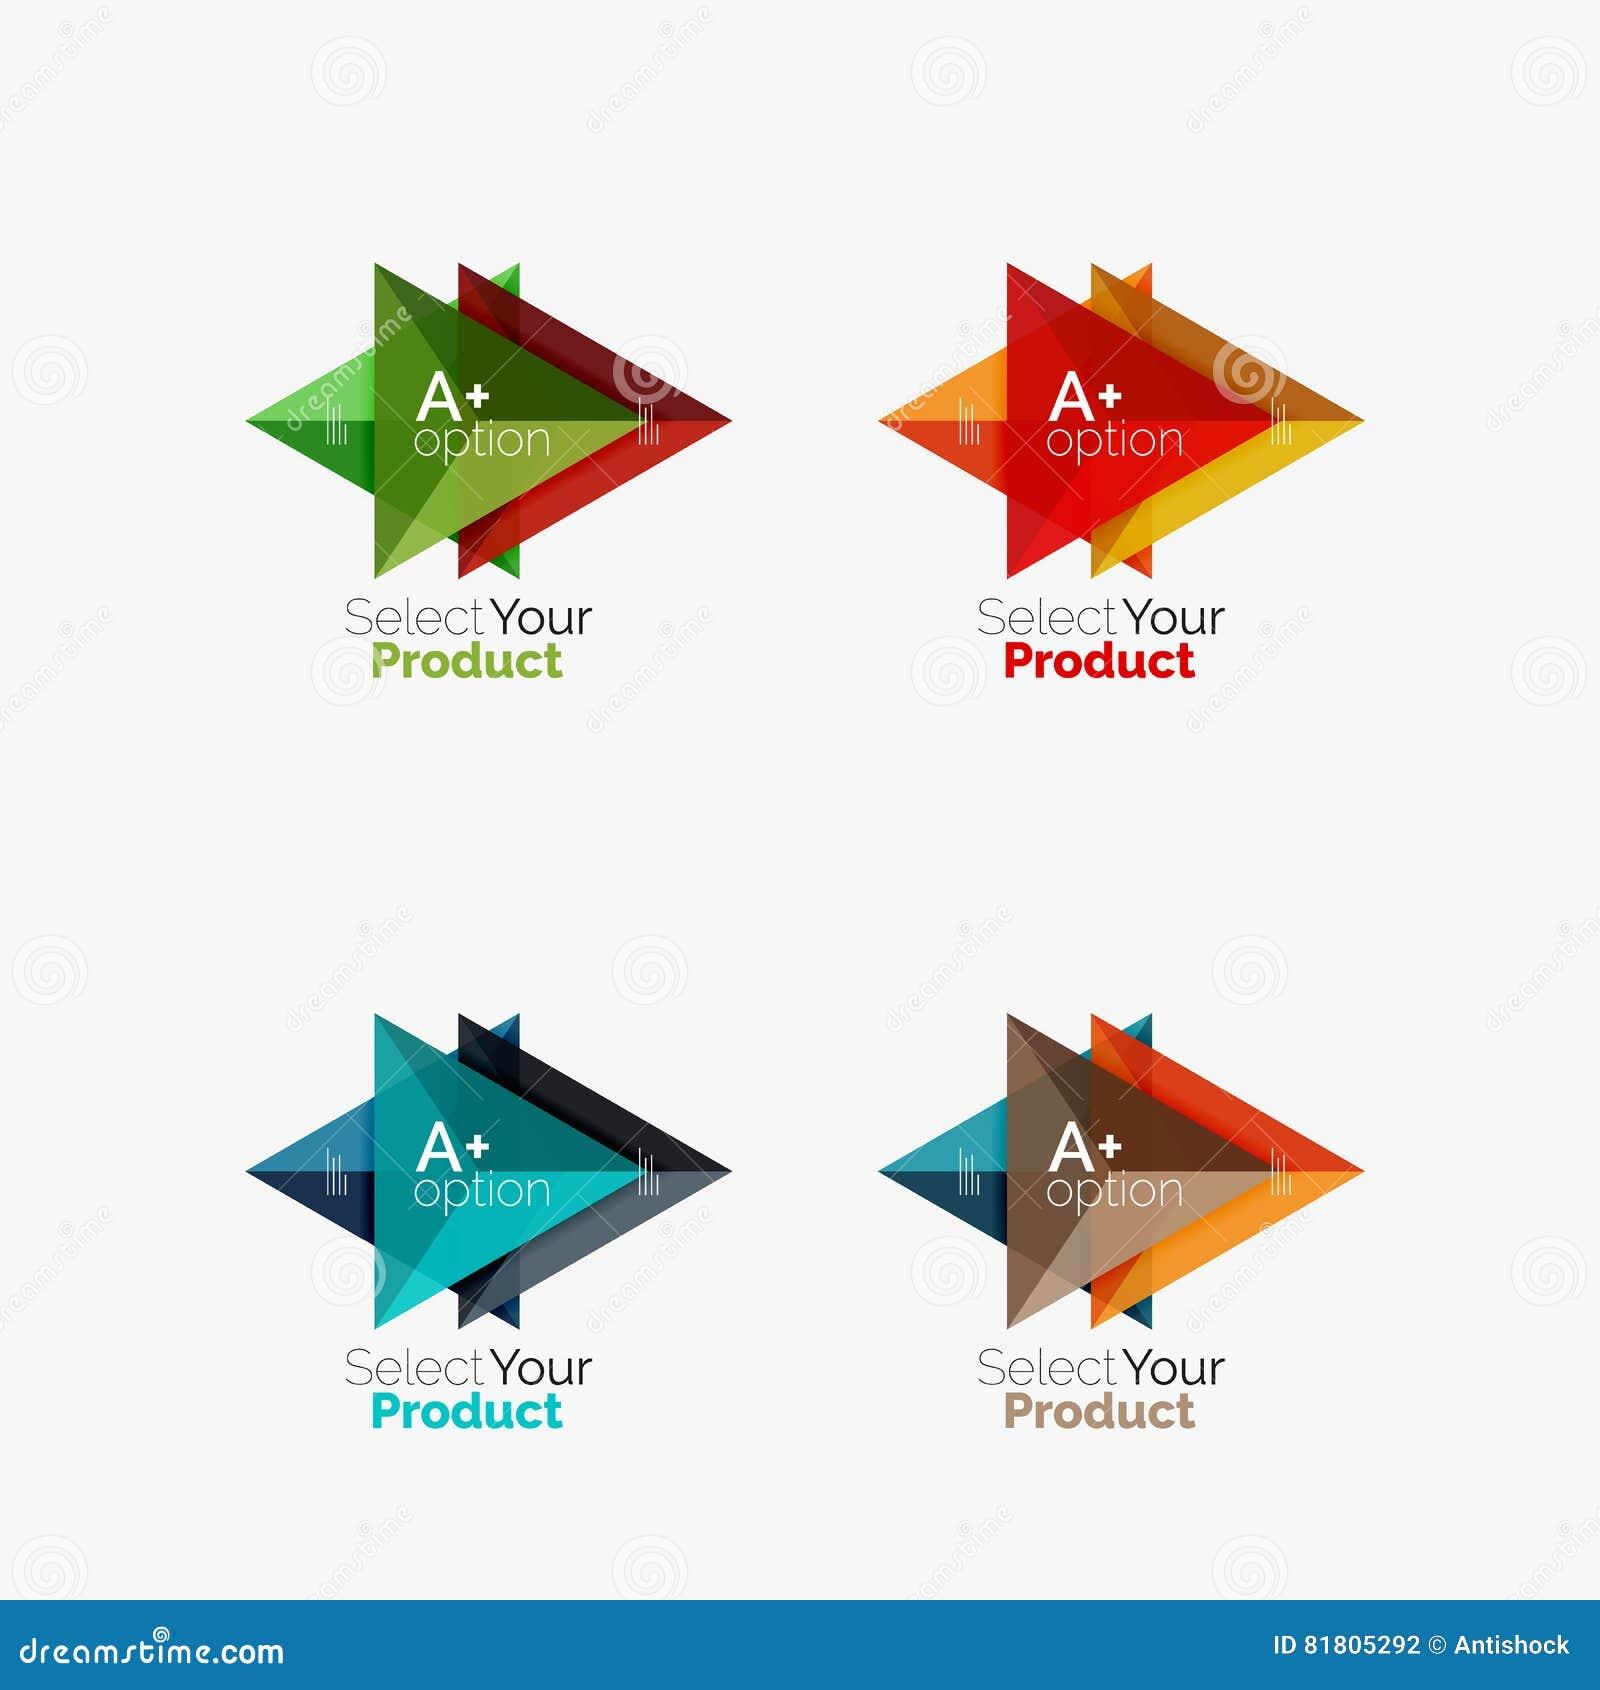 Комплект планов треугольника infographic с текстом и вариантами